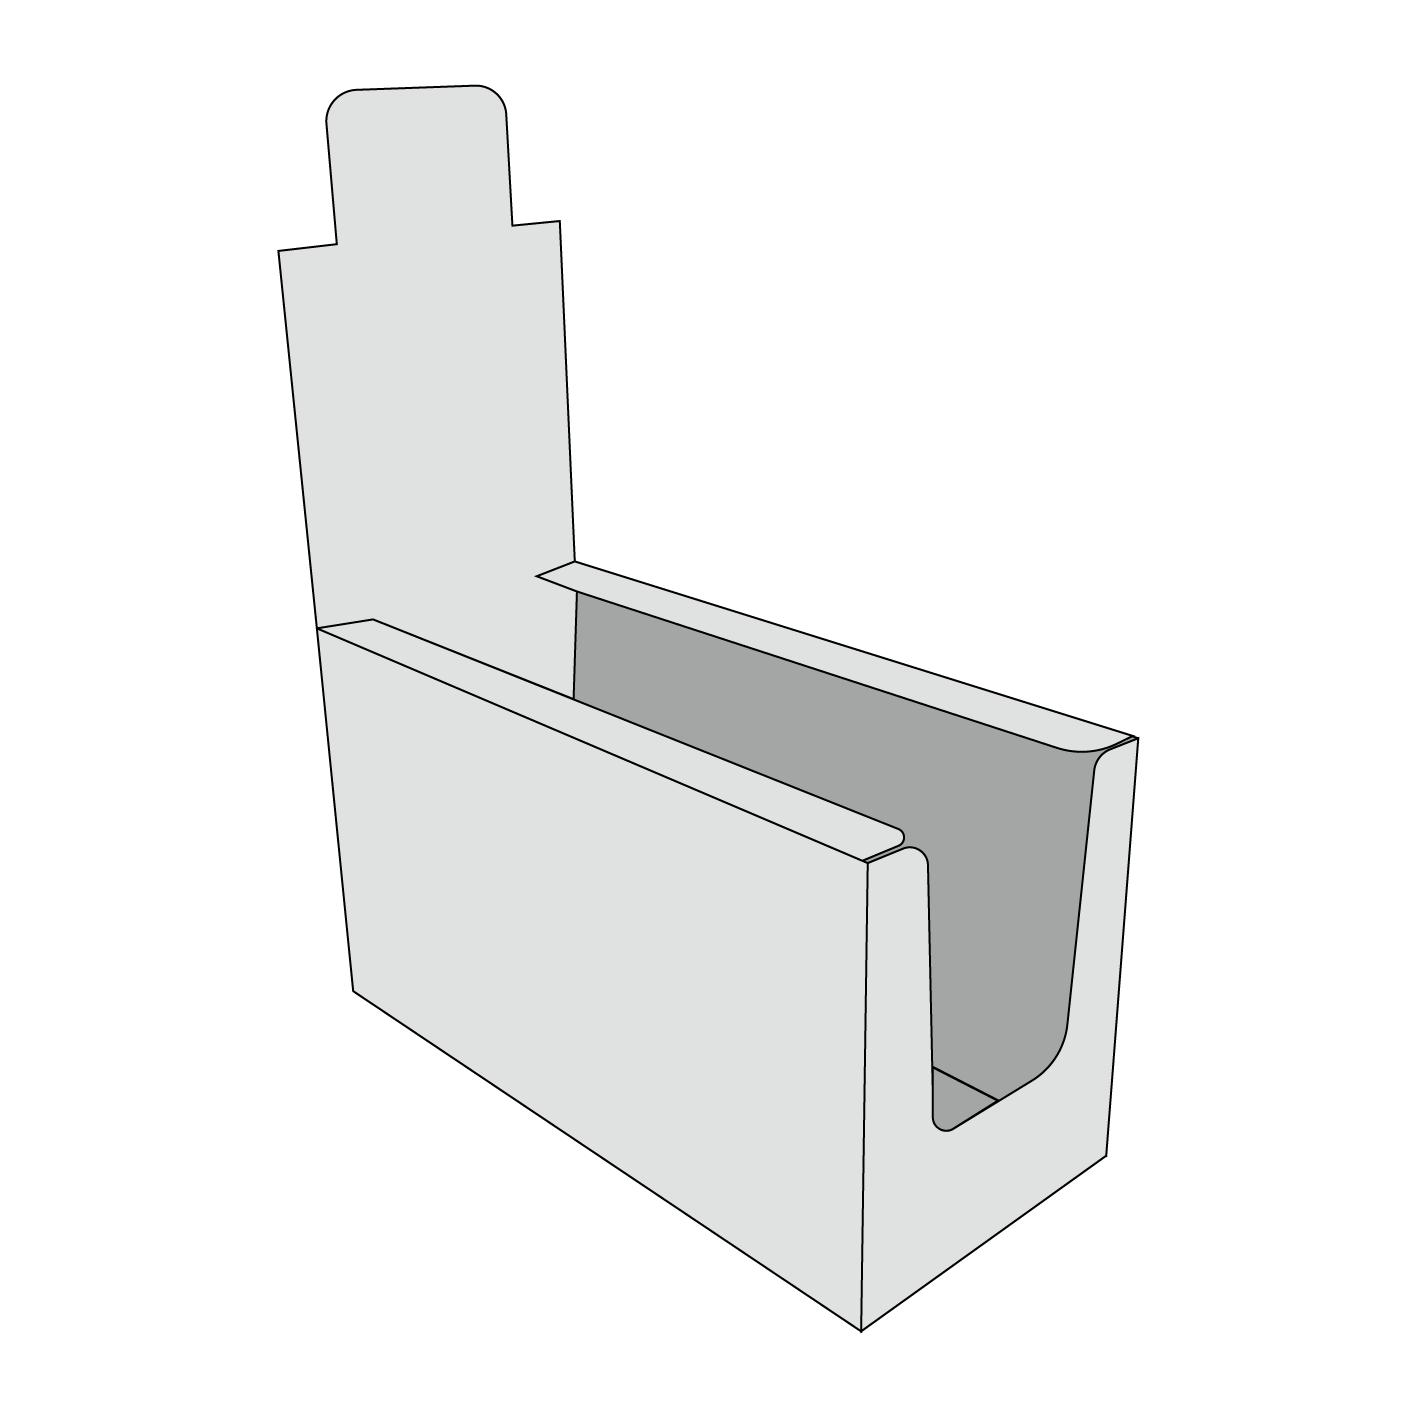 Craftpak Corrugated Box